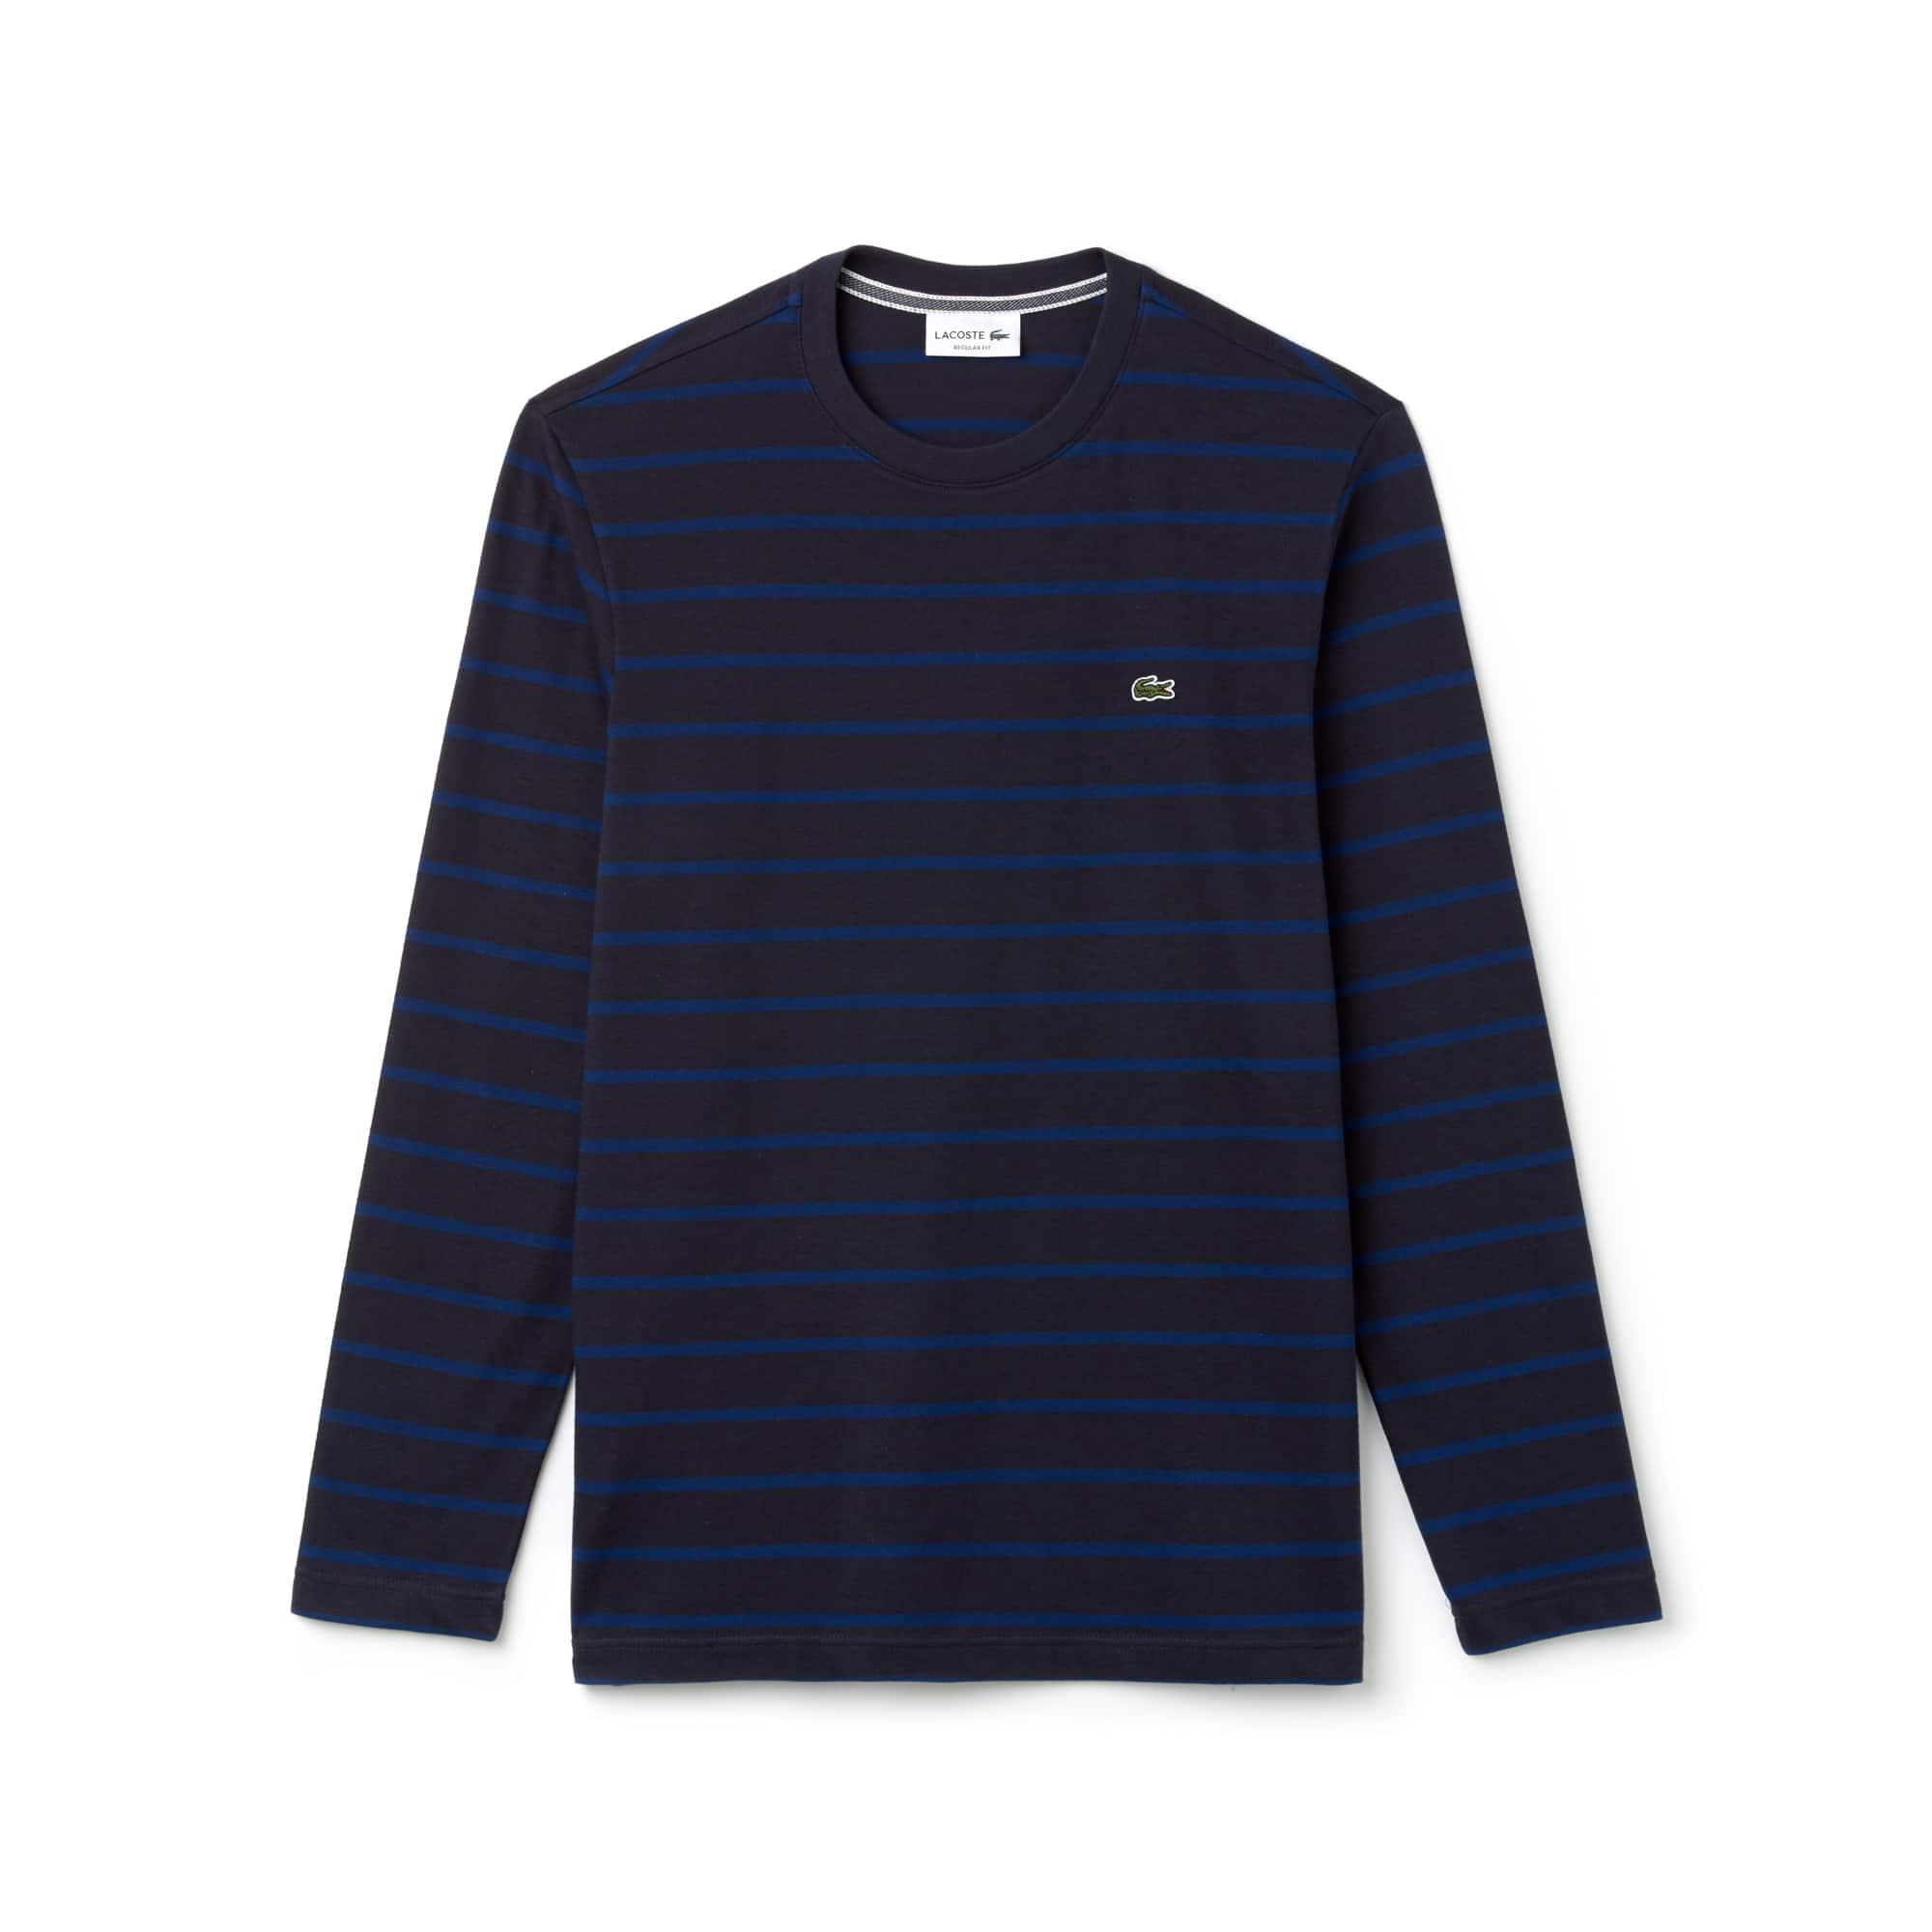 Men's Crew Neck Striped Jersey T-shirt